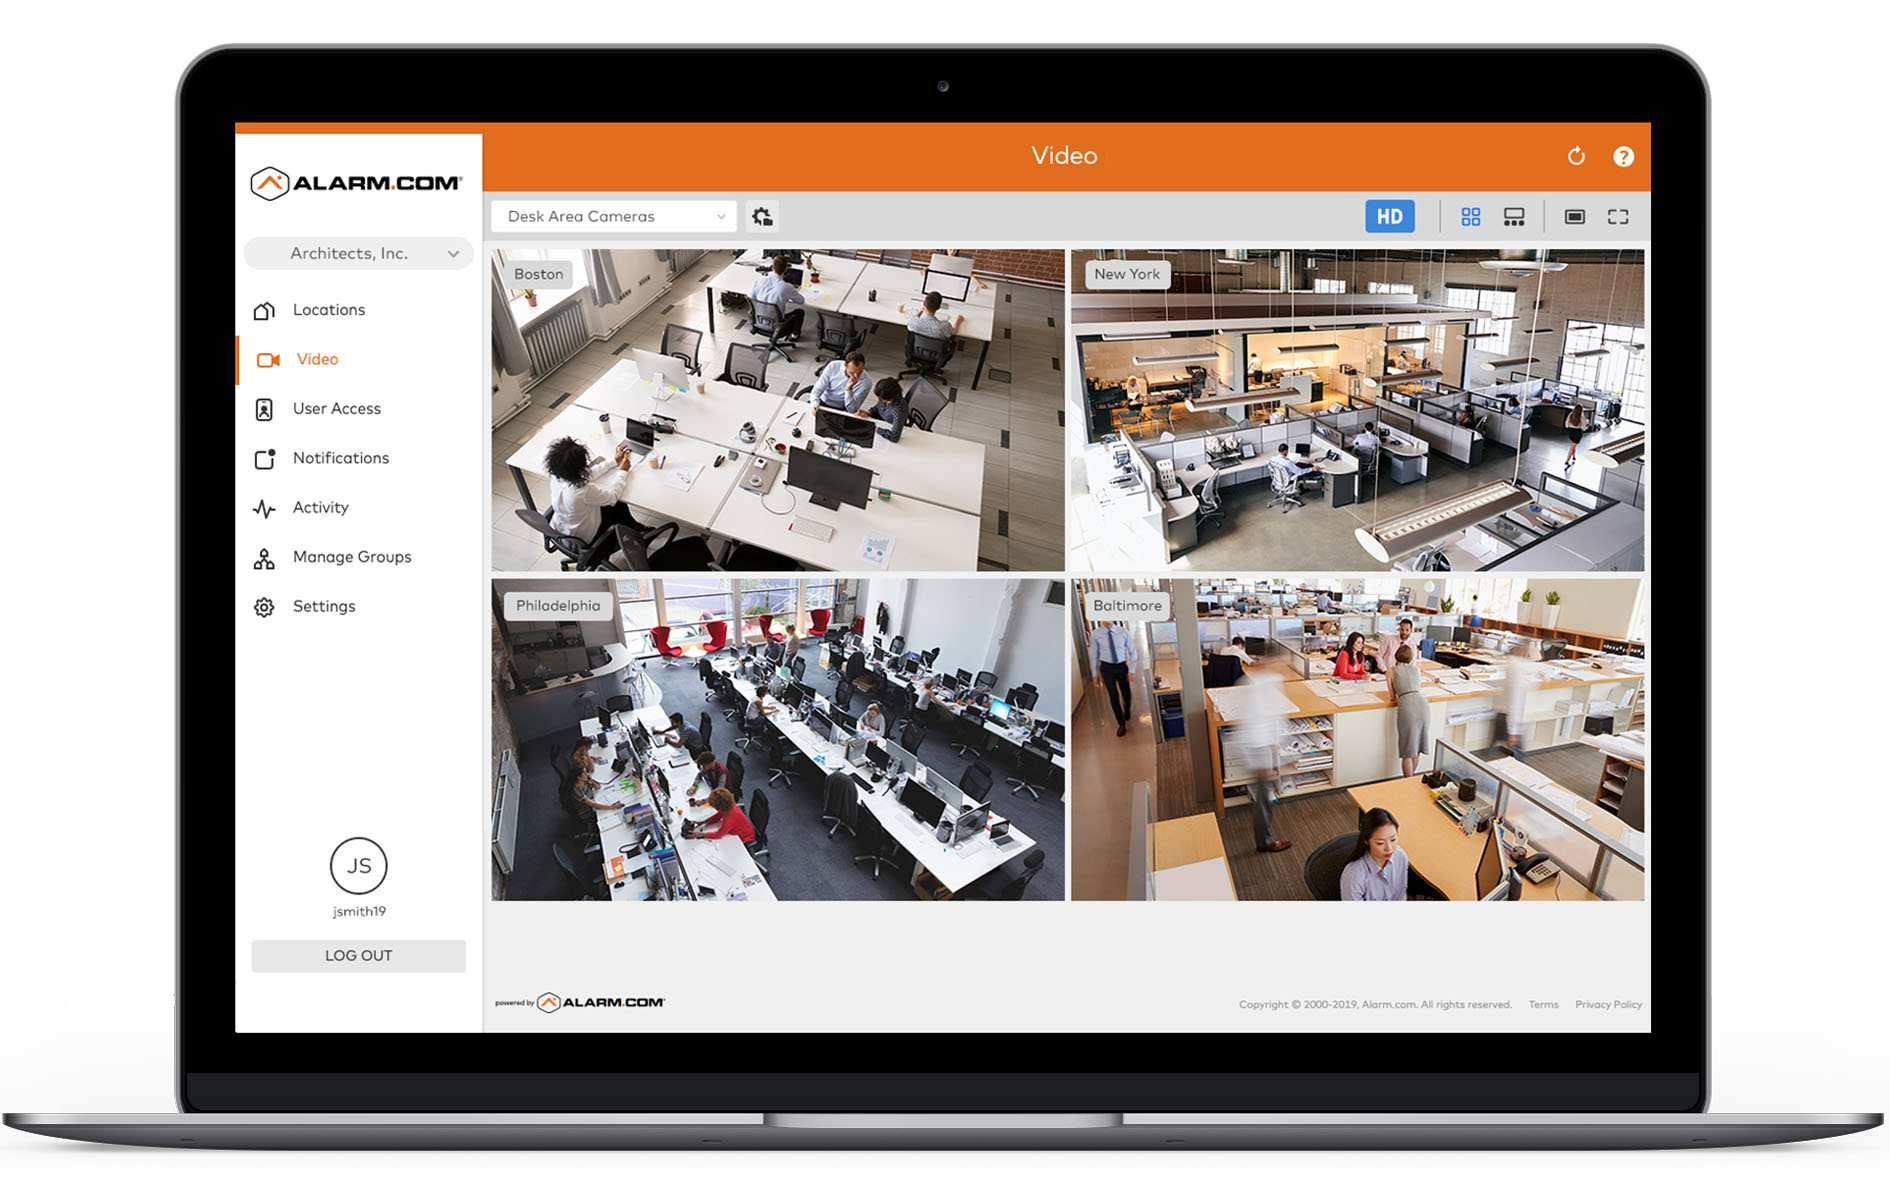 Surveillance camera monitoring workplace